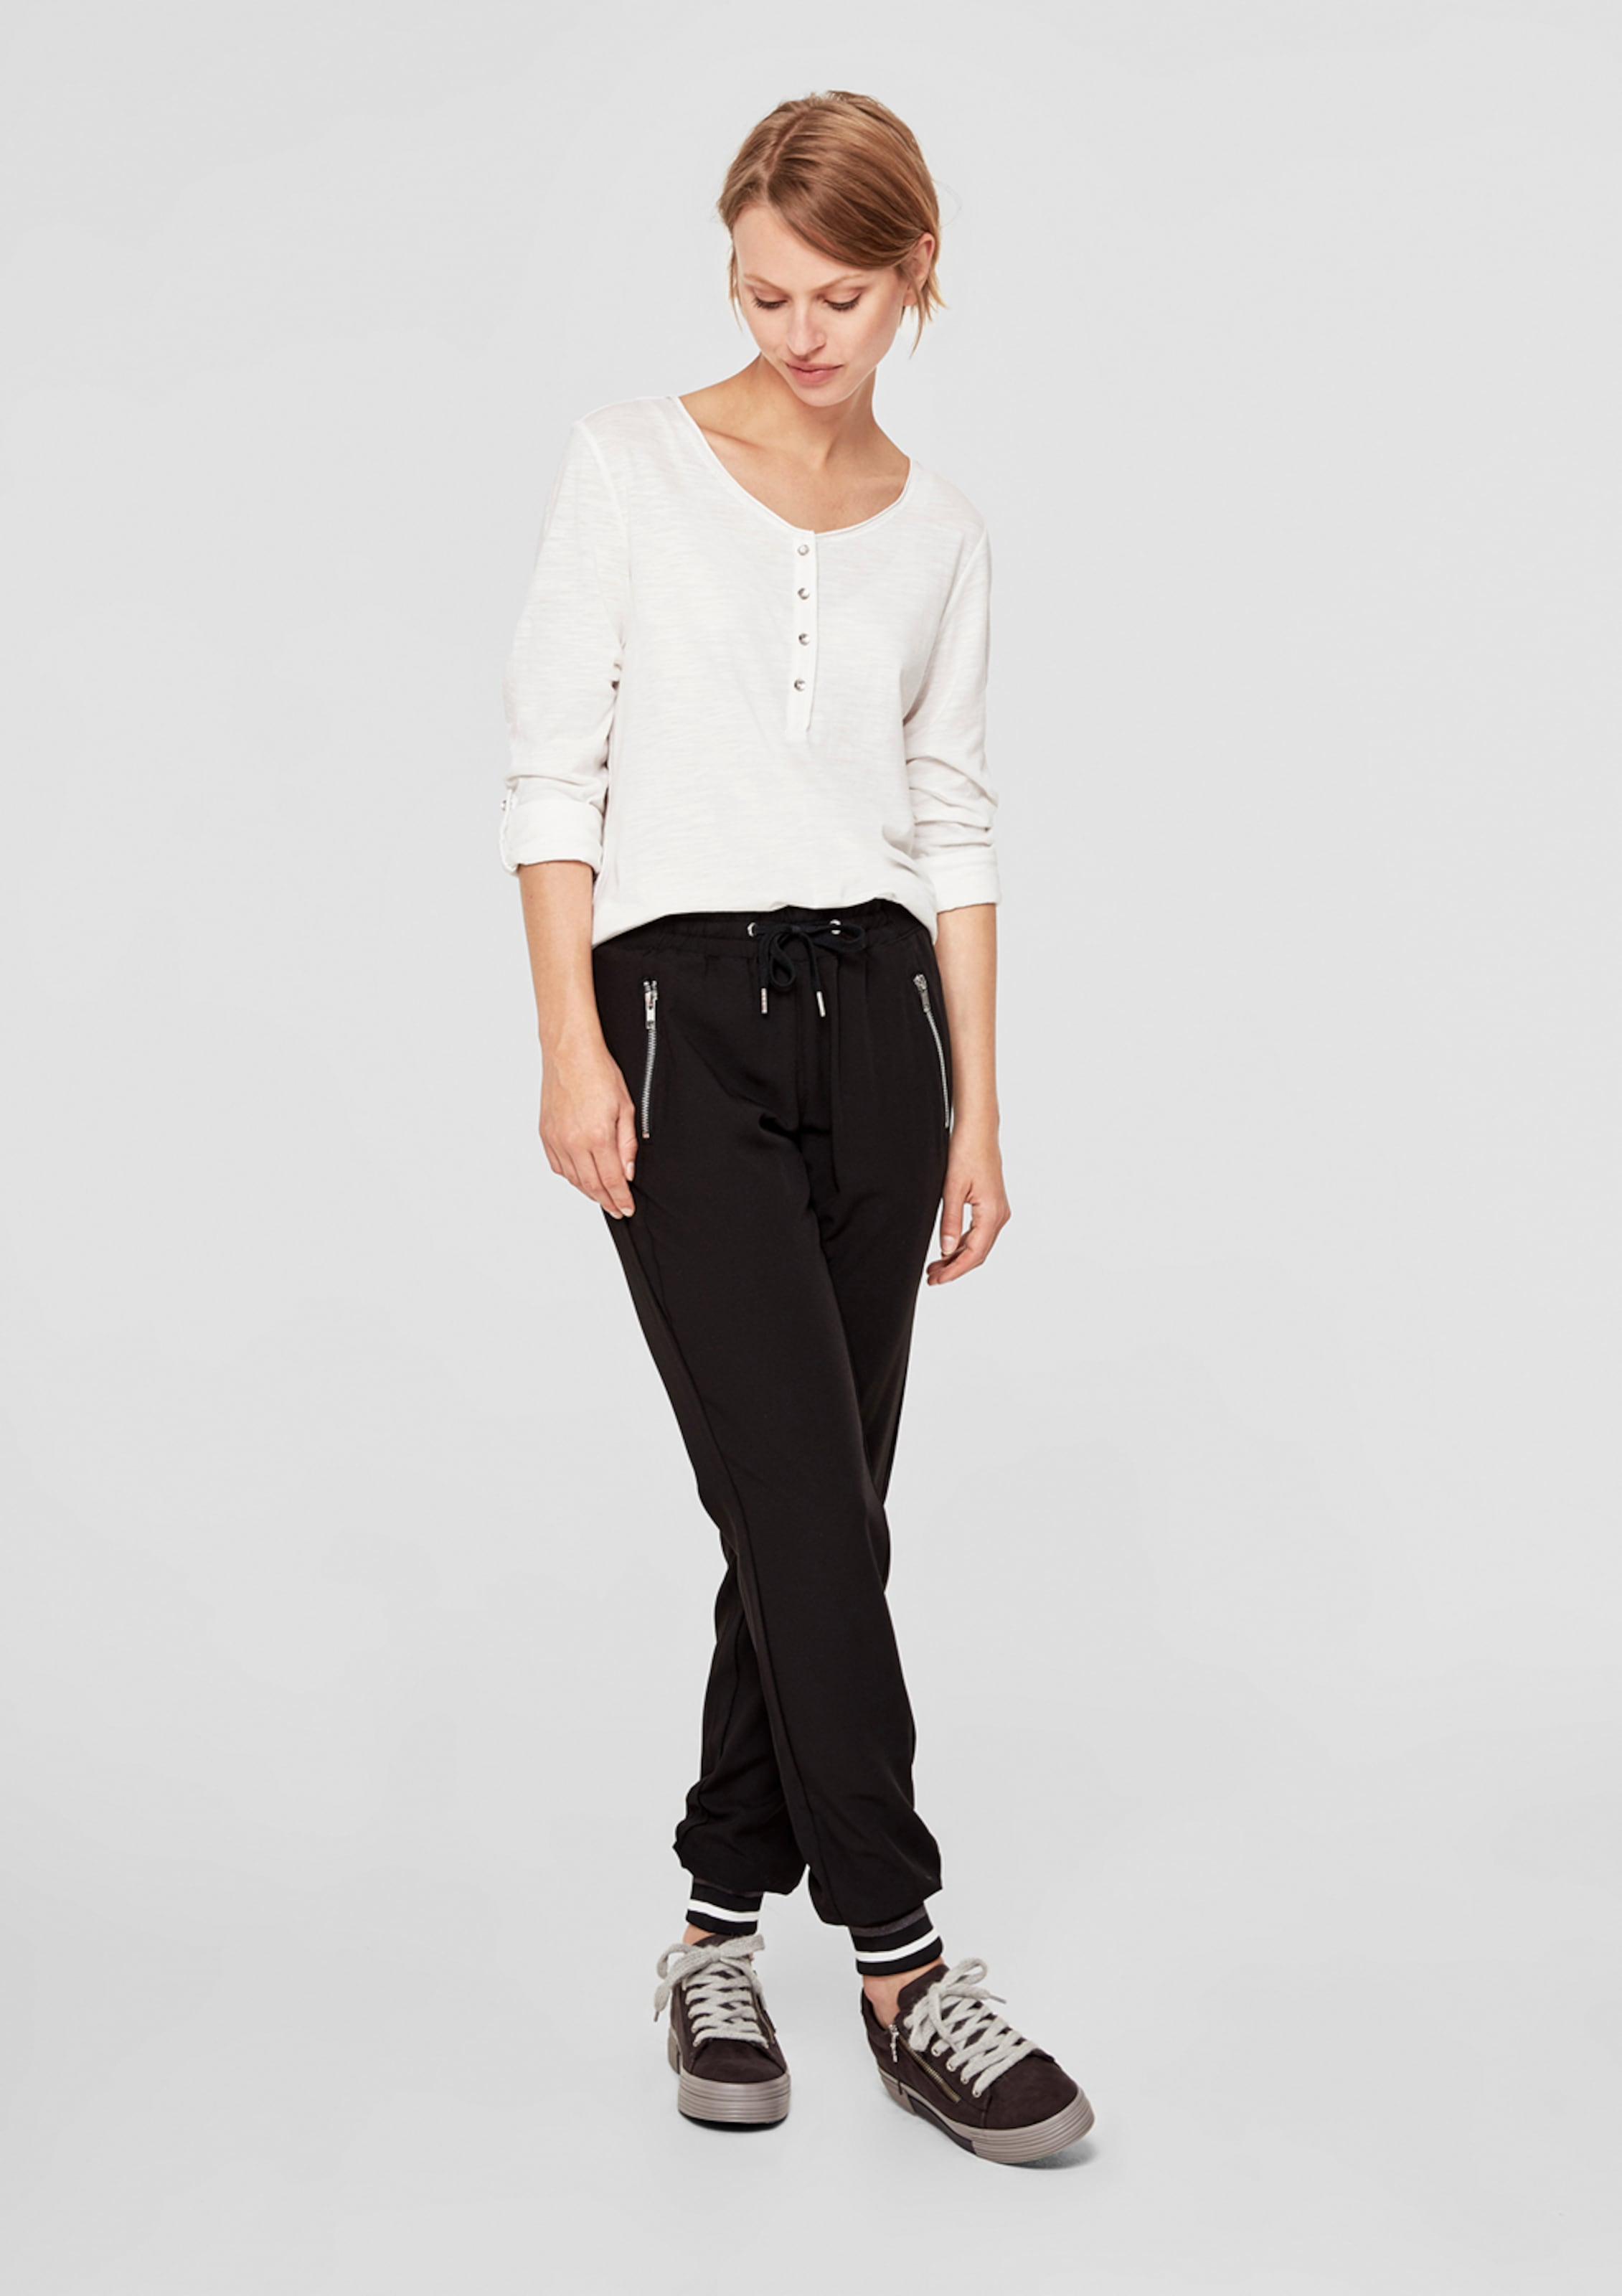 oliver oliver In Shirt Shirt In Weiß S S Weiß fI6ybm7Ygv